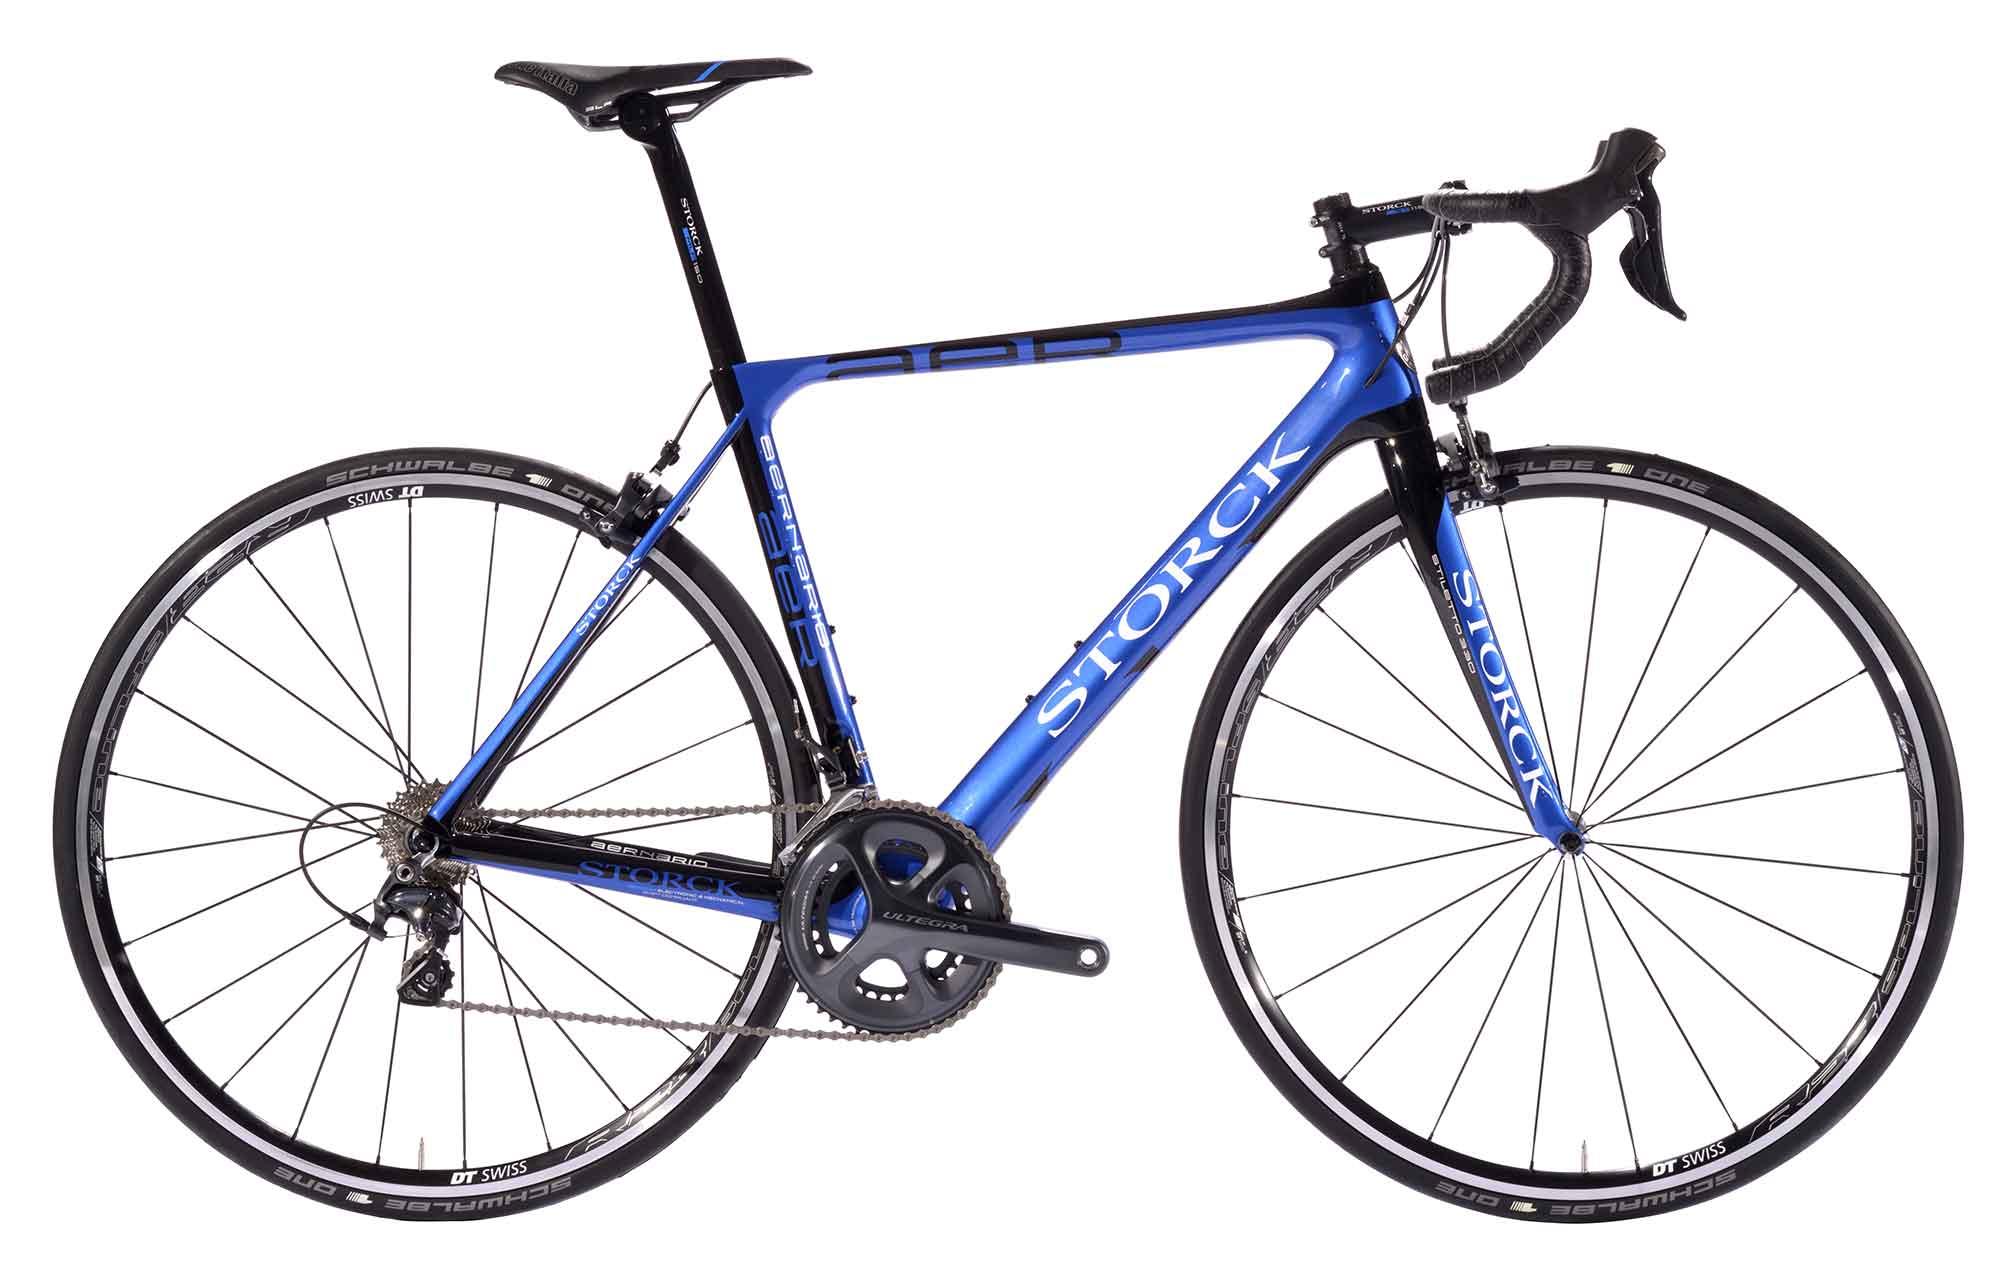 storck aernario basic ultegra bike r a cycles. Black Bedroom Furniture Sets. Home Design Ideas